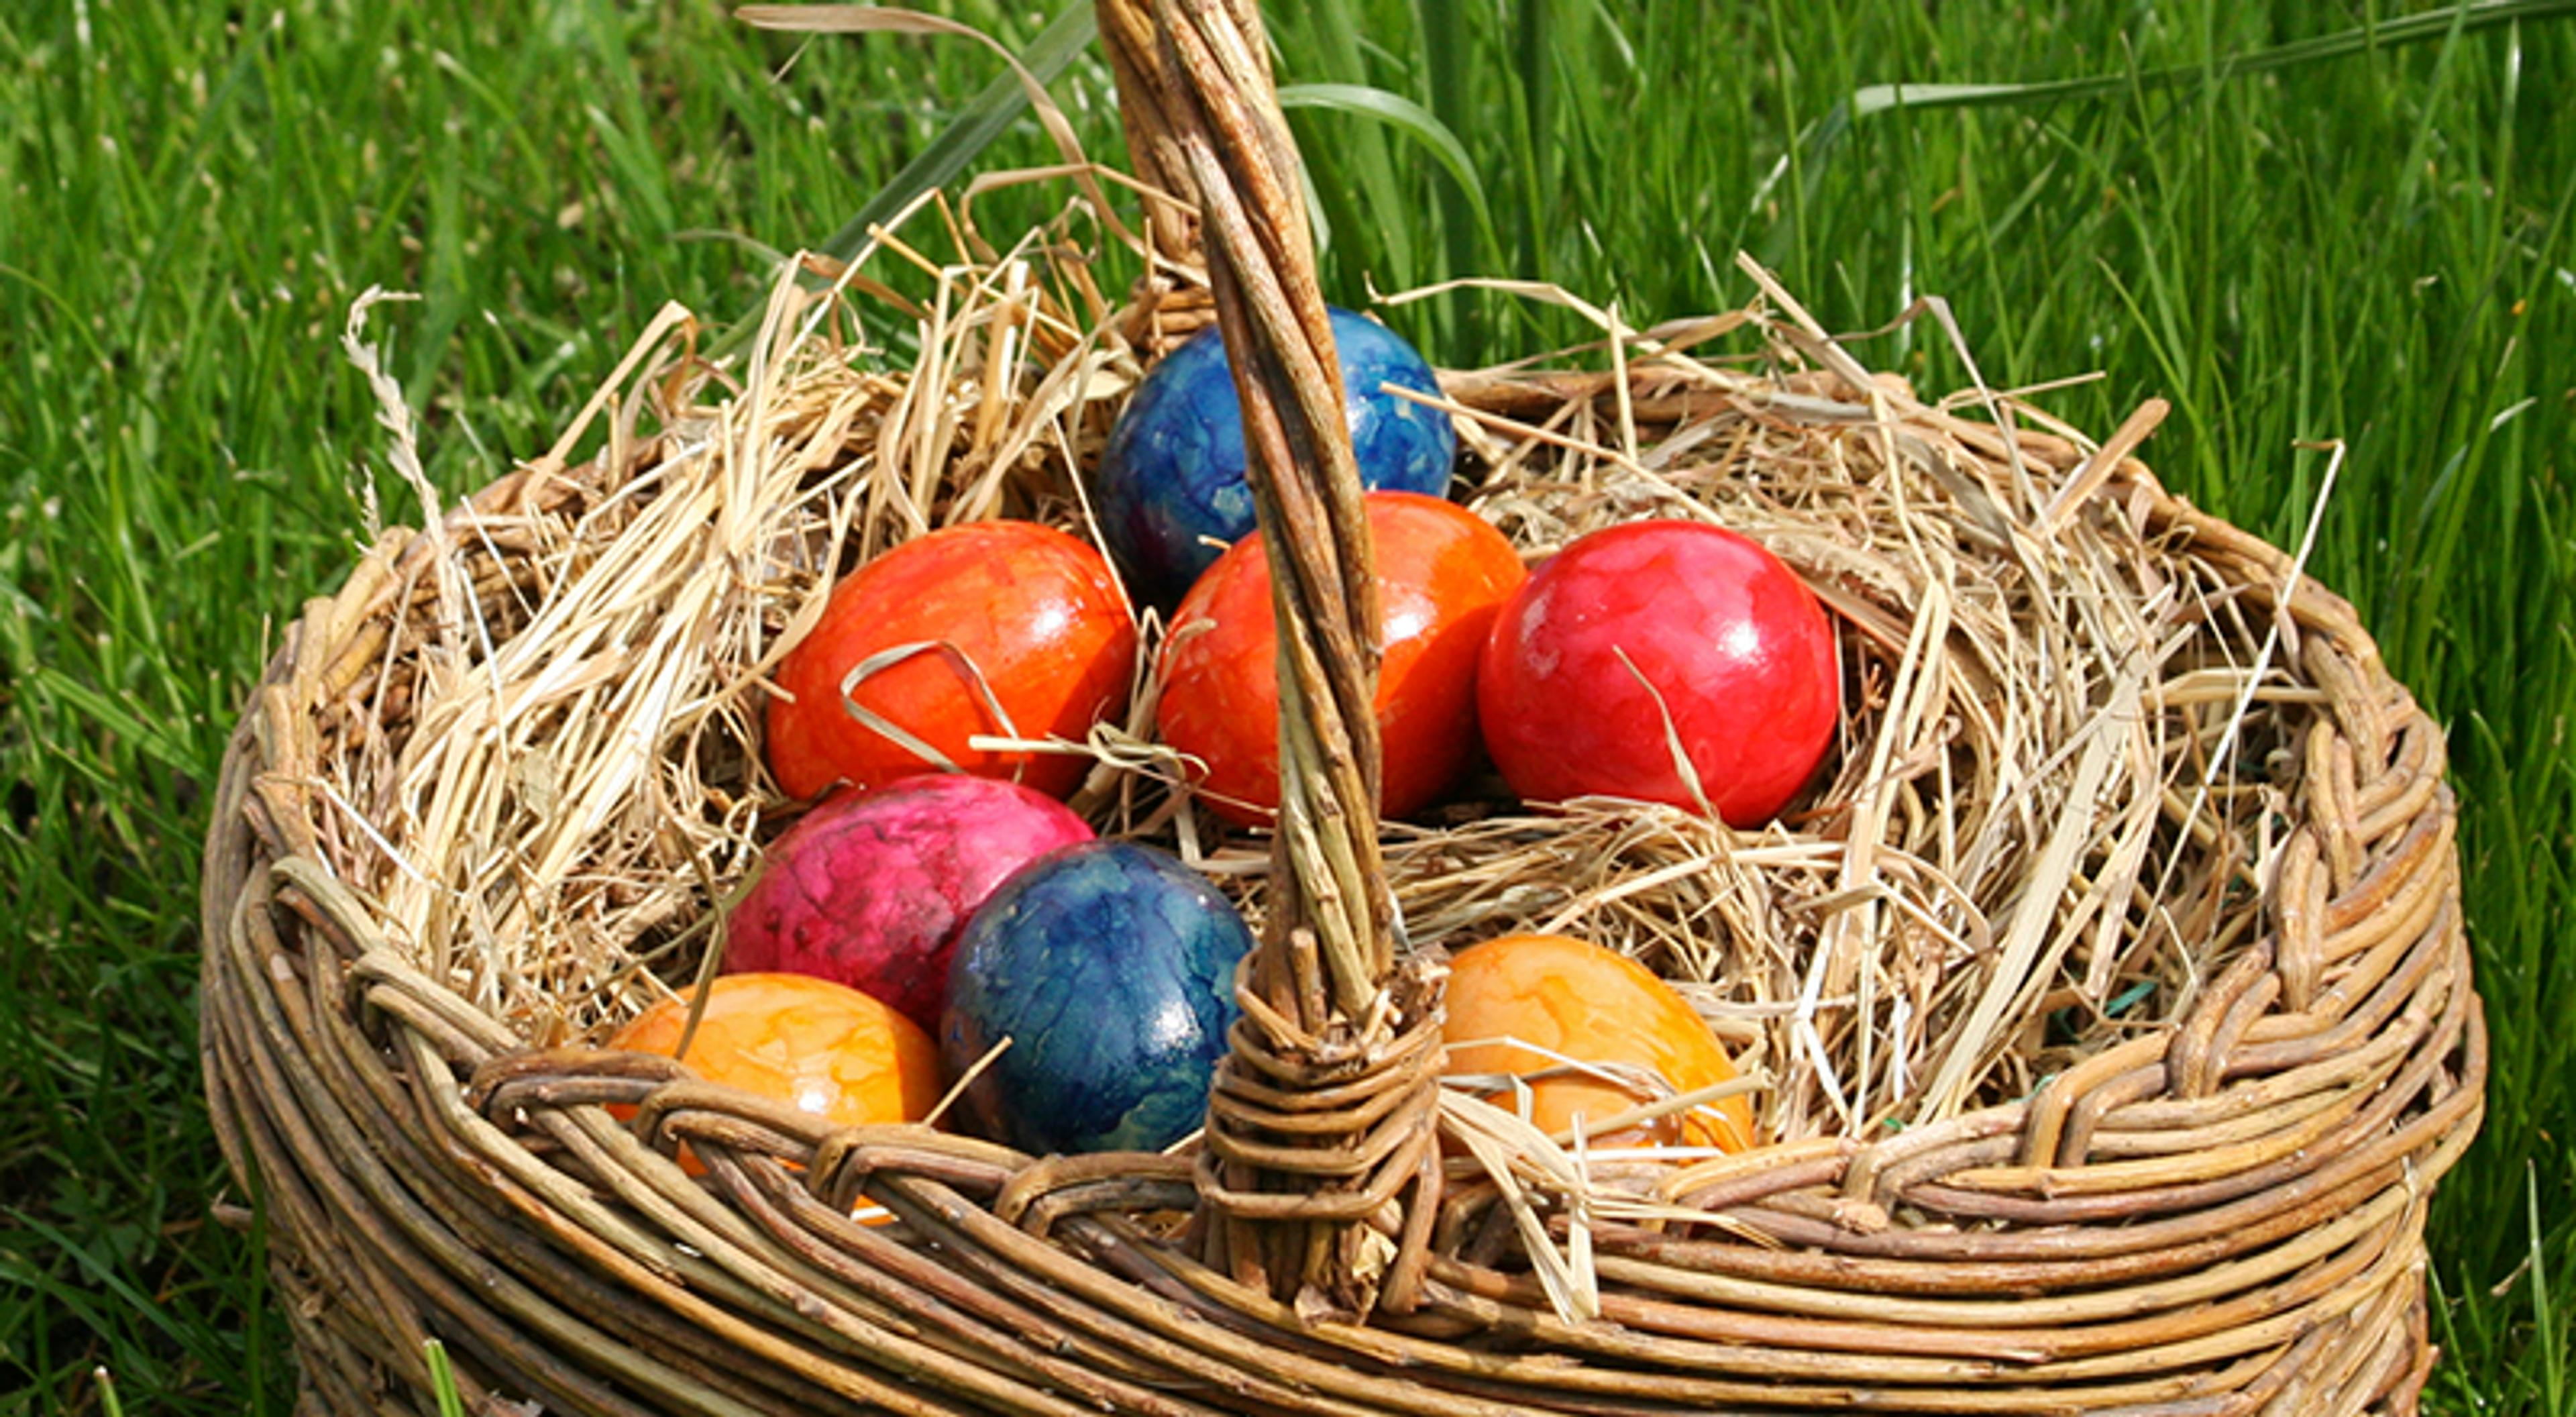 Tips for en artigere påskefrokost med egg